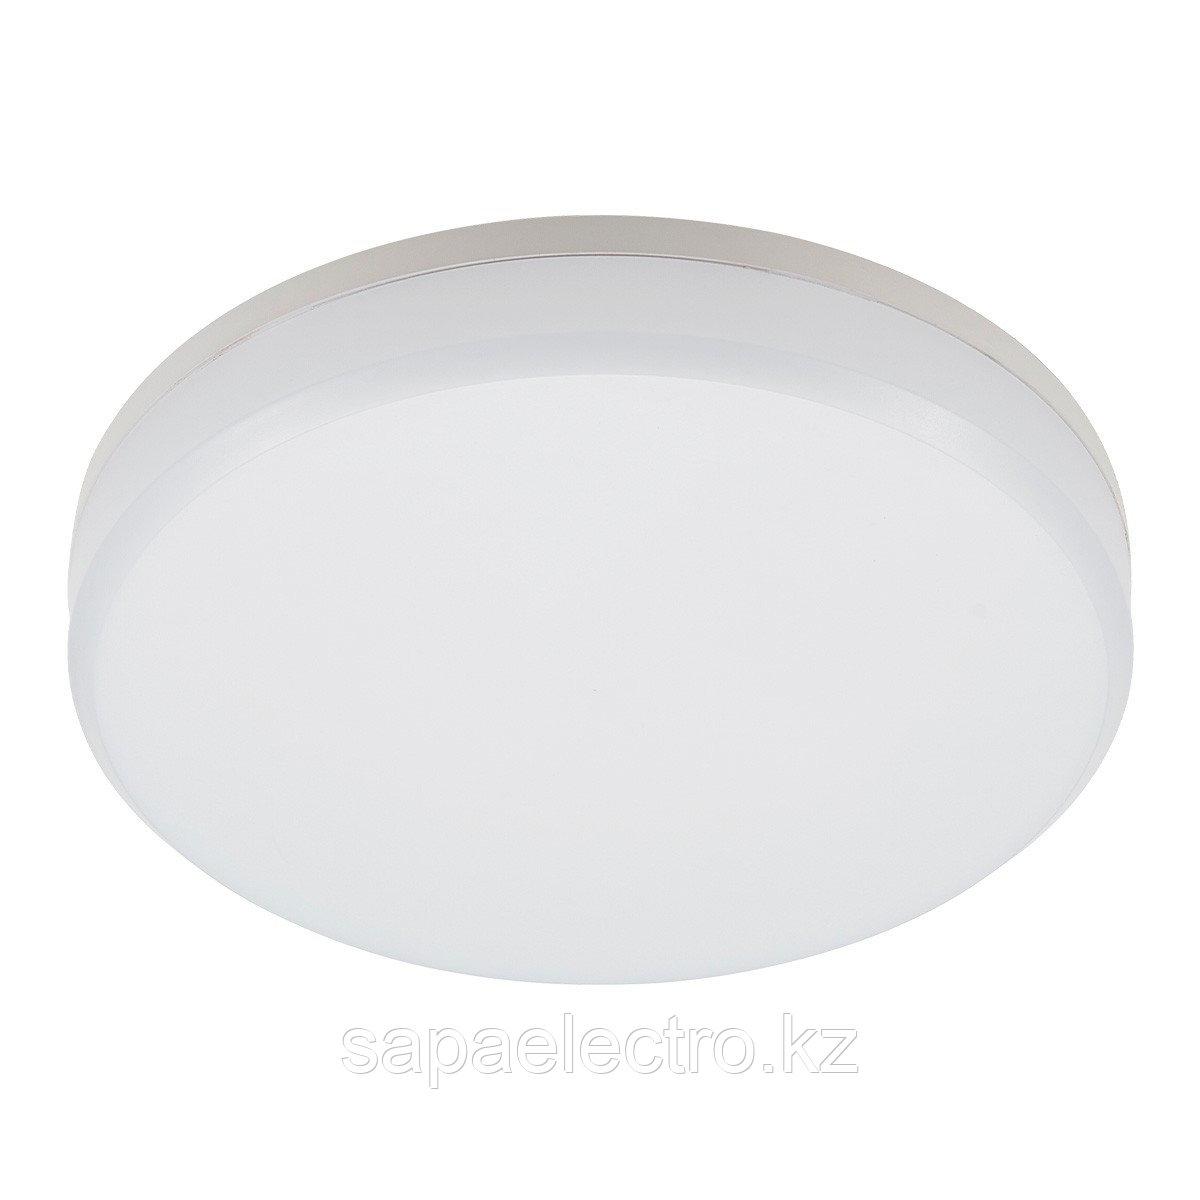 Свет-к LED NIKA ROUND 15W 5500K IP44  (TS )24шт